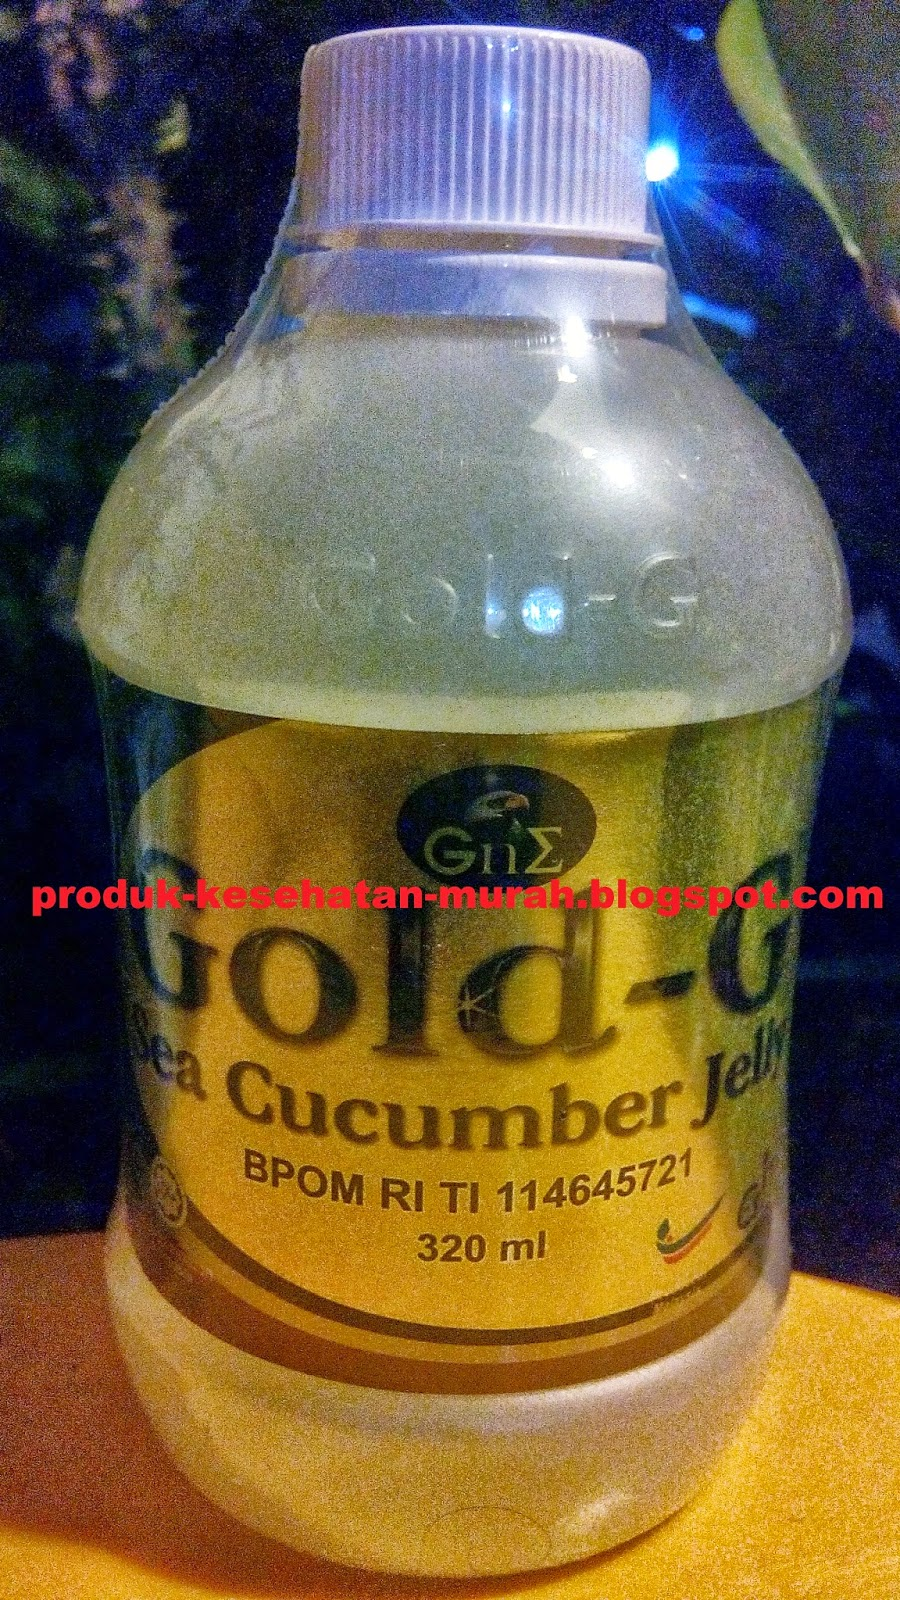 Gamat GOLD G Sea Cucumber Jelly